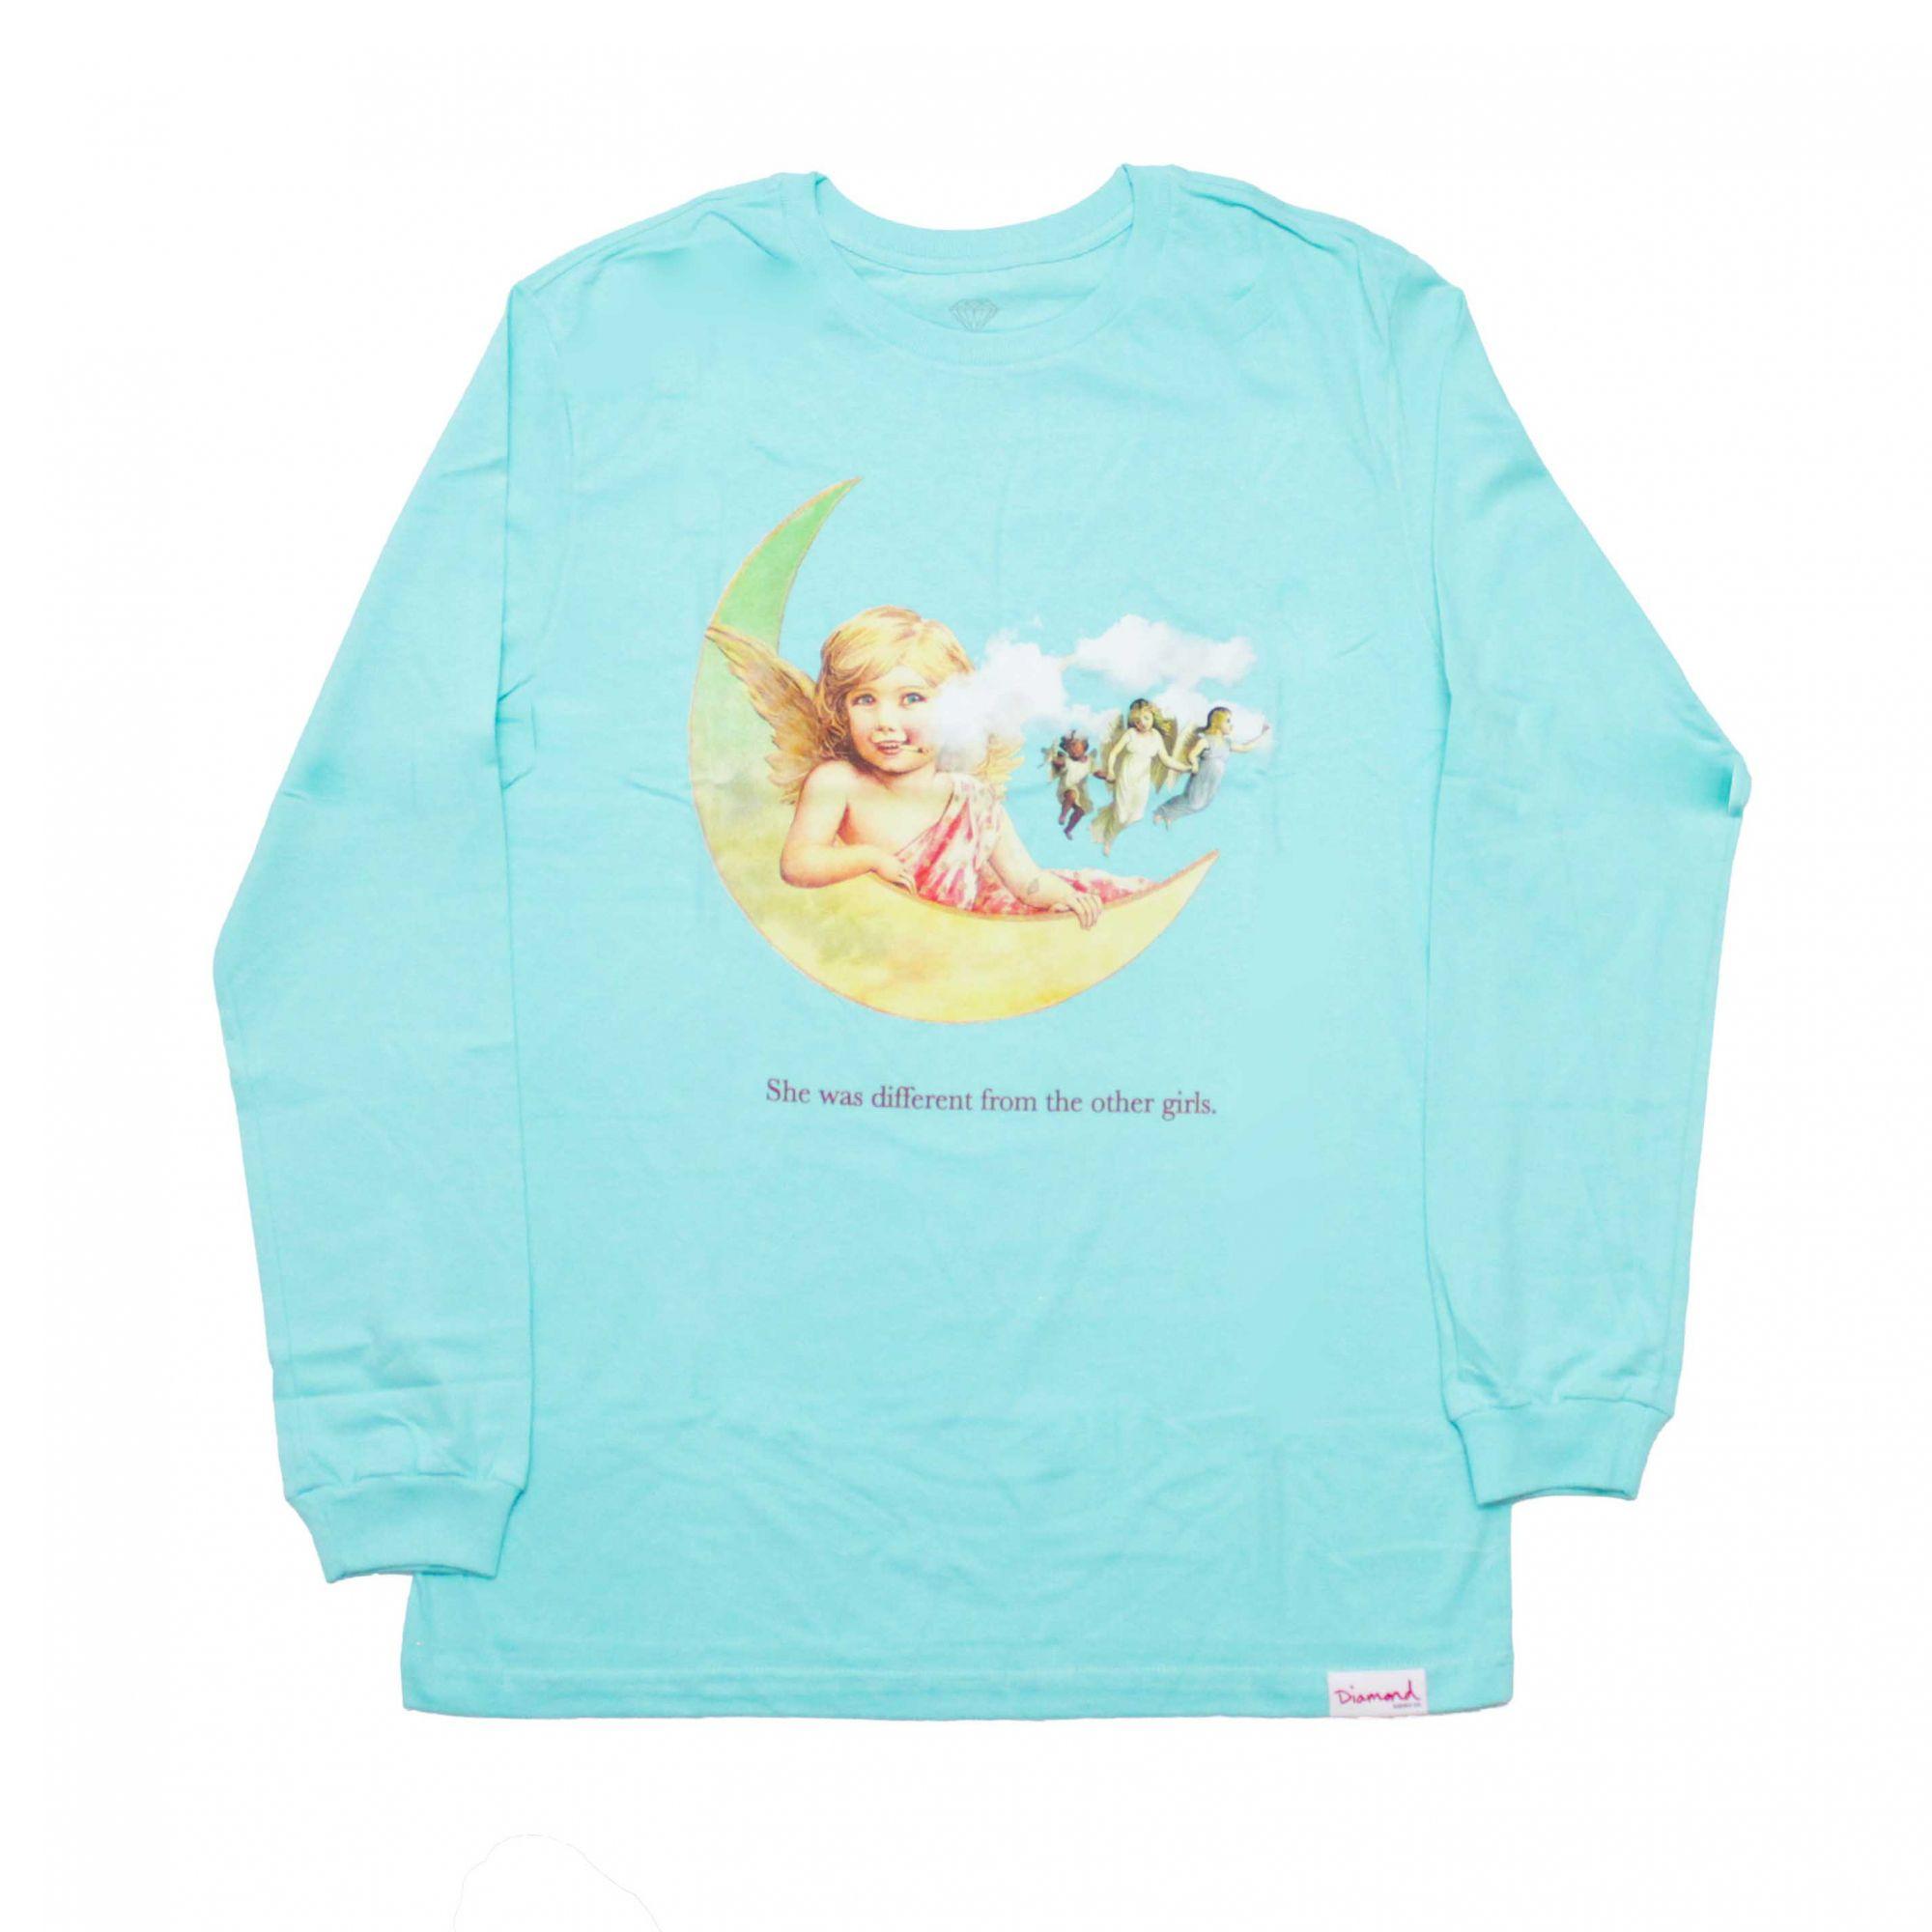 Camiseta Manga Longa Diamond Other Girls Verde Água